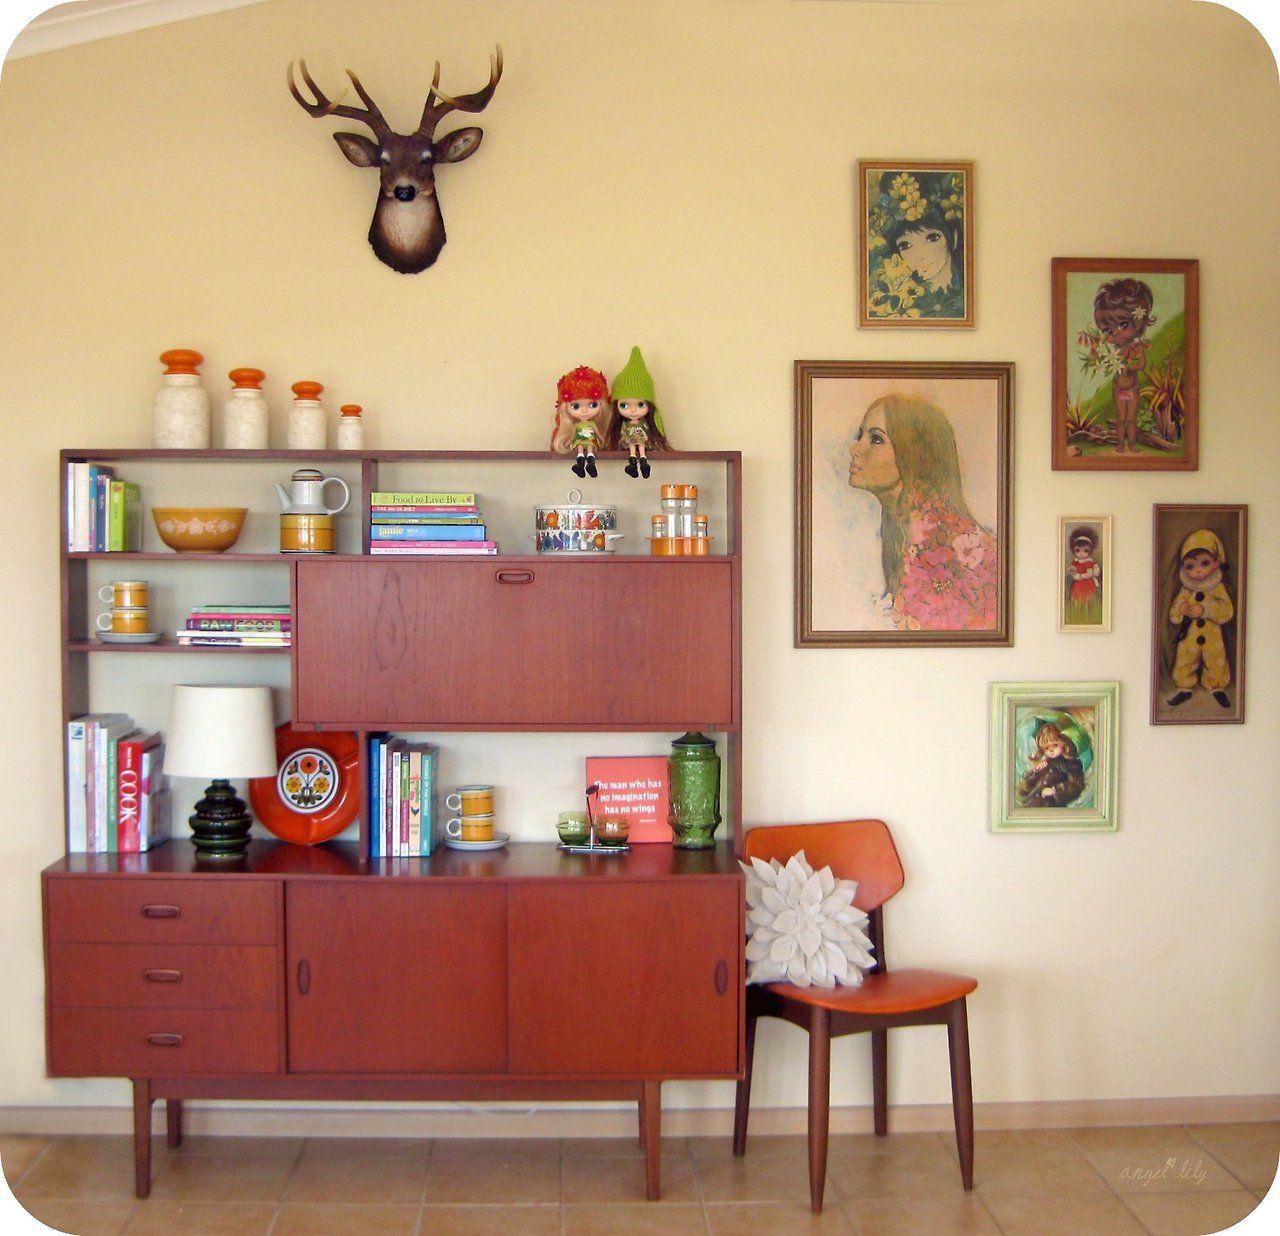 Displaying Art Knick Knacks Retro Home Home Decor Home Living room knick knacks